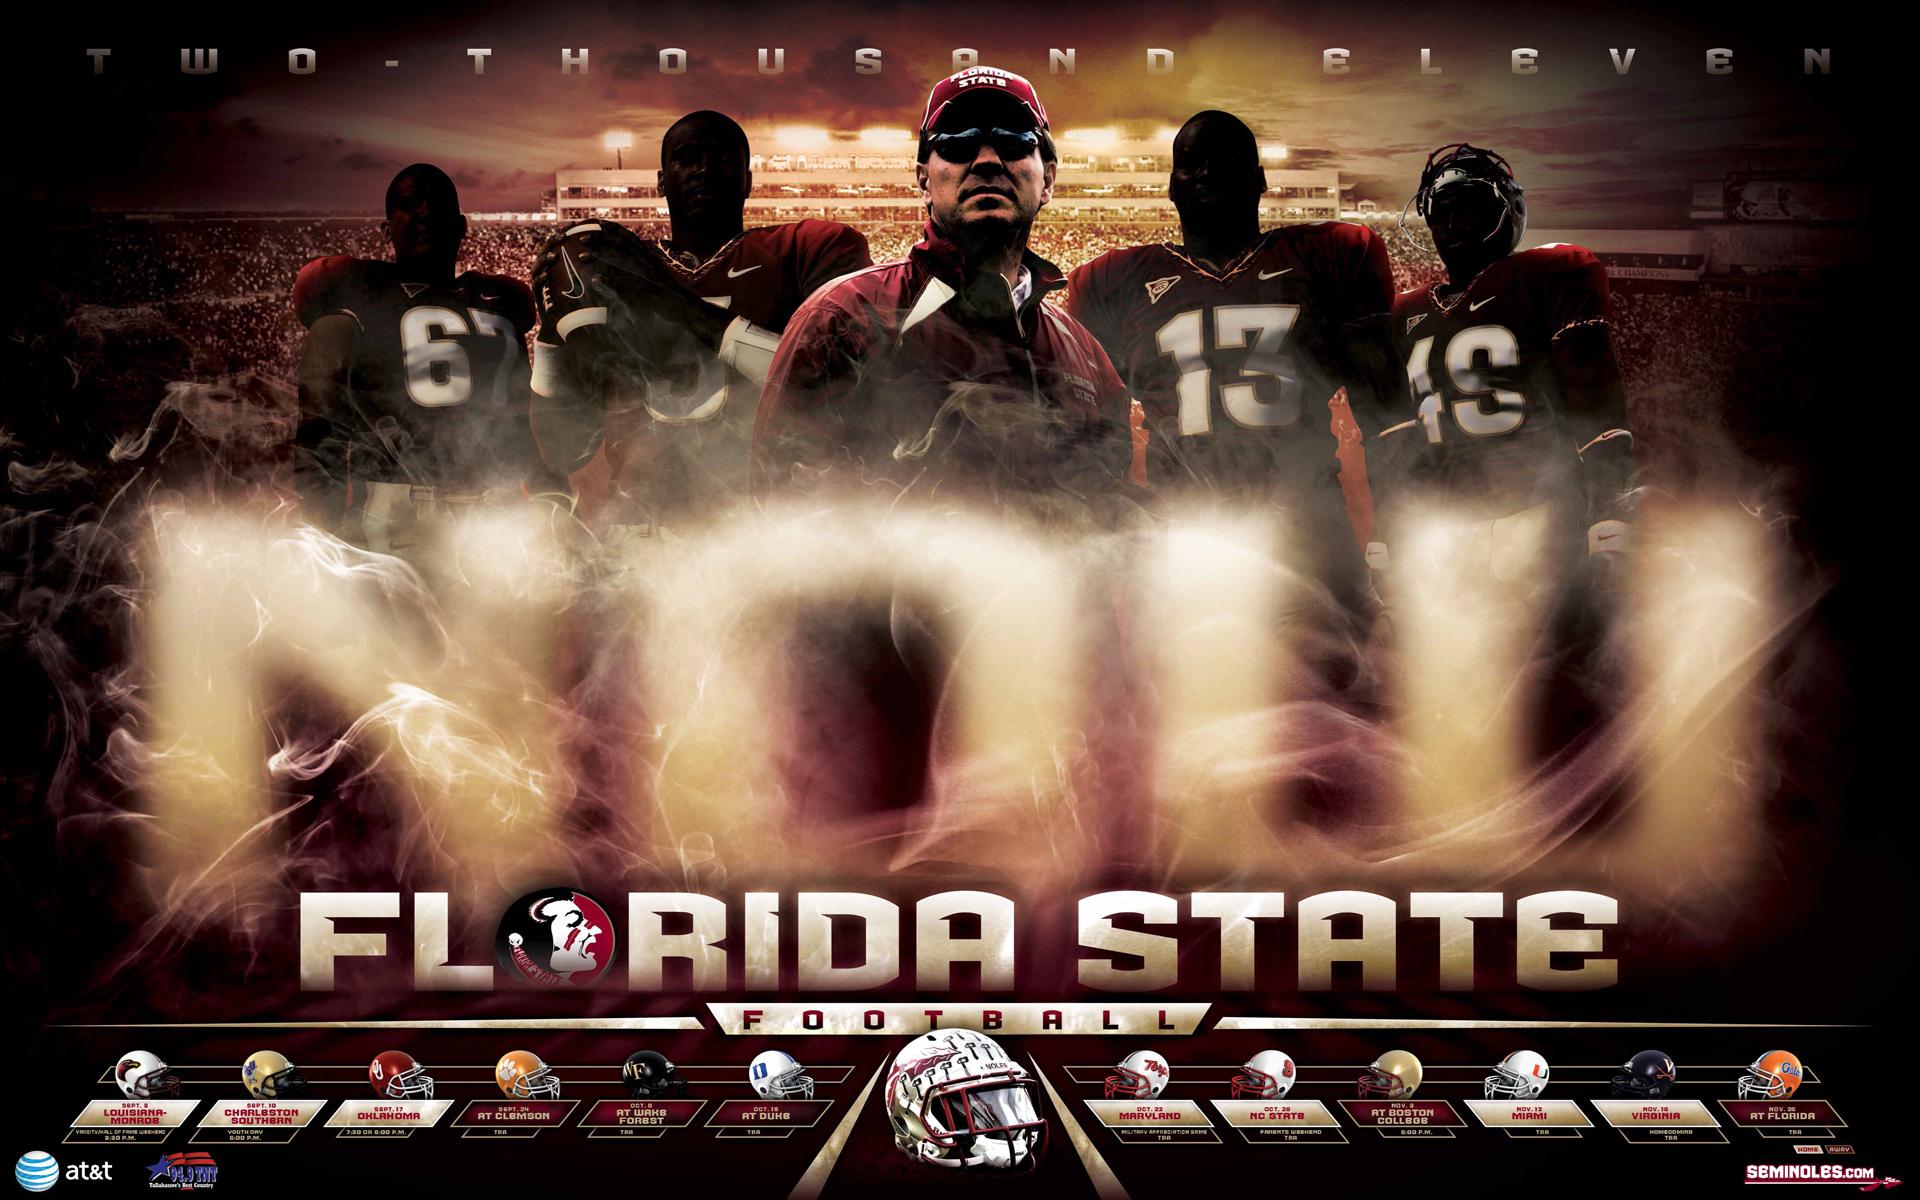 Florida state seminoles football wallpaper wallpapersafari florida state seminoles wallpaper florida state seminoles 1920x1200 voltagebd Gallery